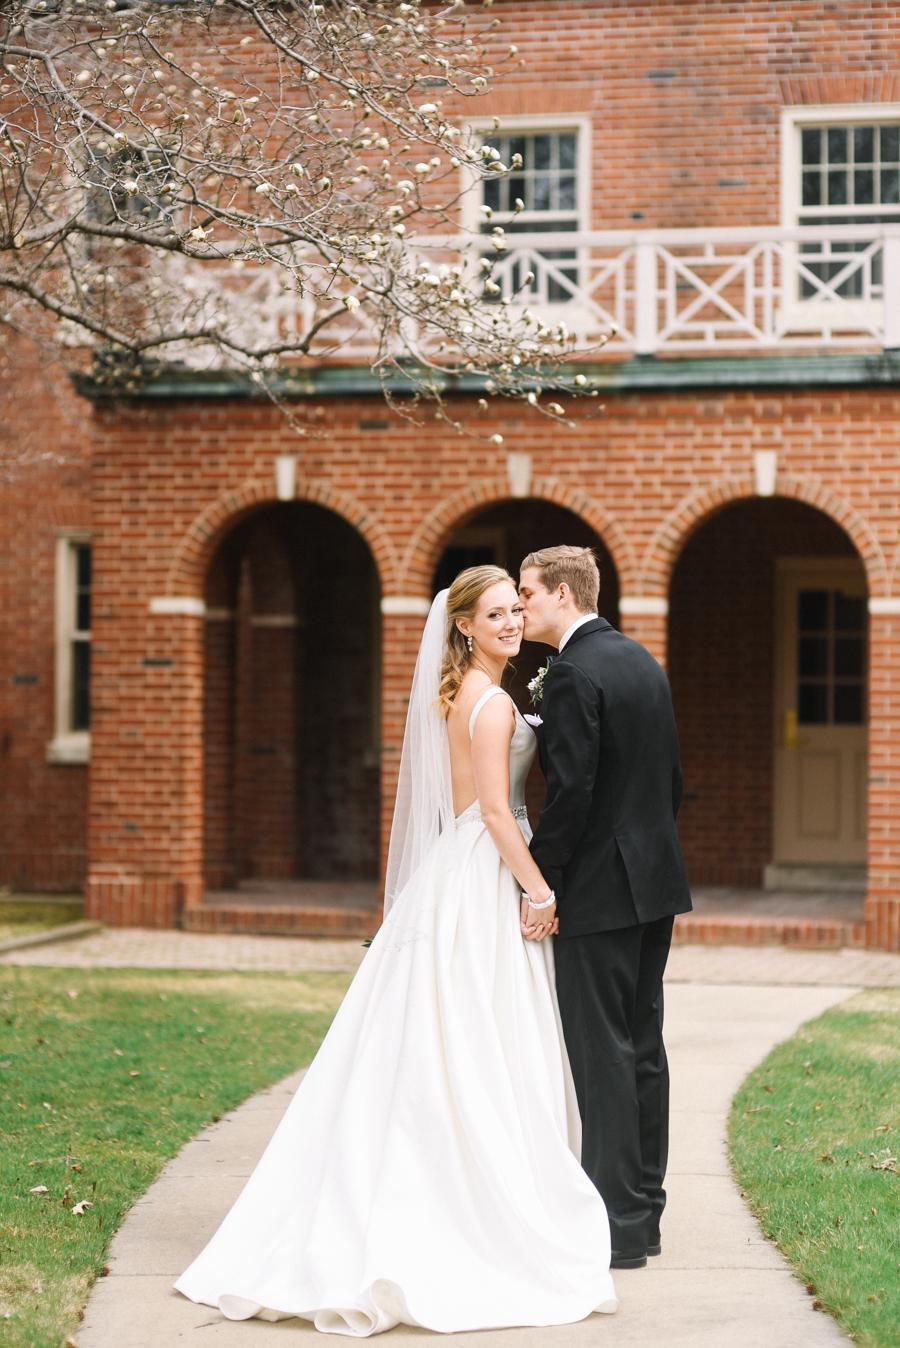 Dearborn_Inn_Wedding-30.jpg